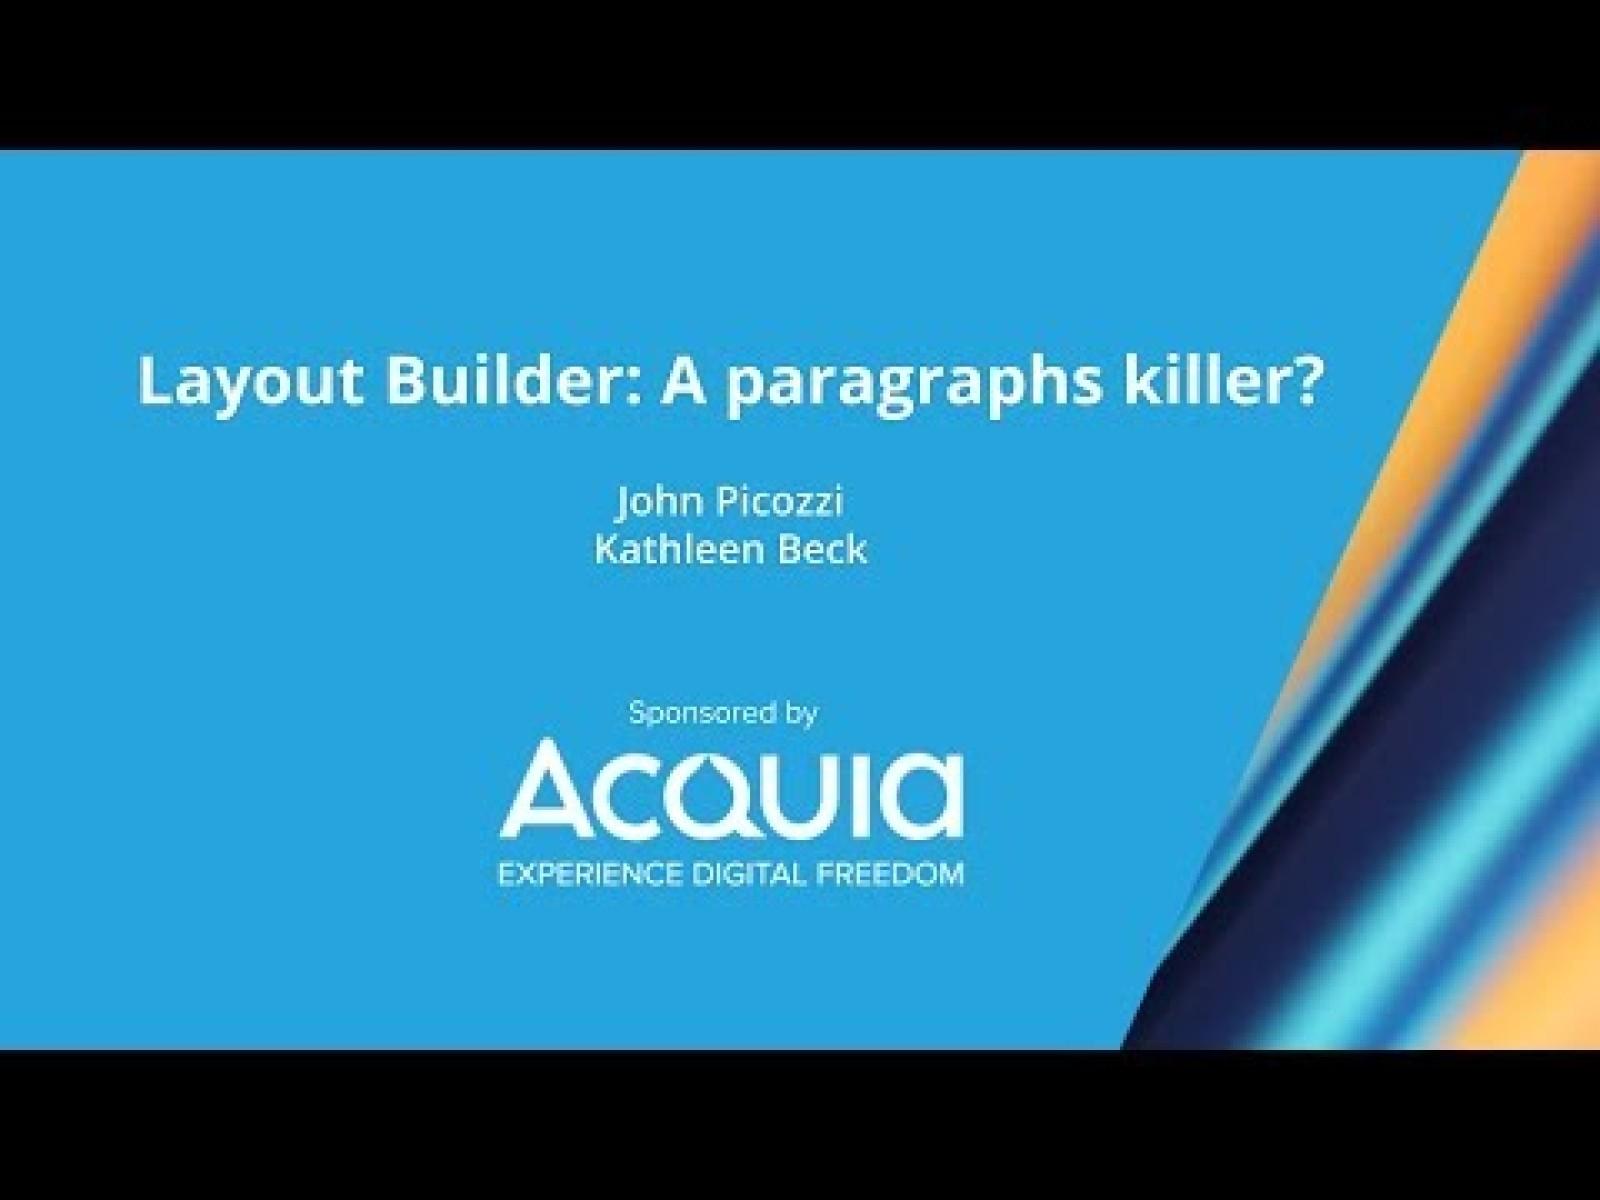 Layout Builder: A paragraphs killer?